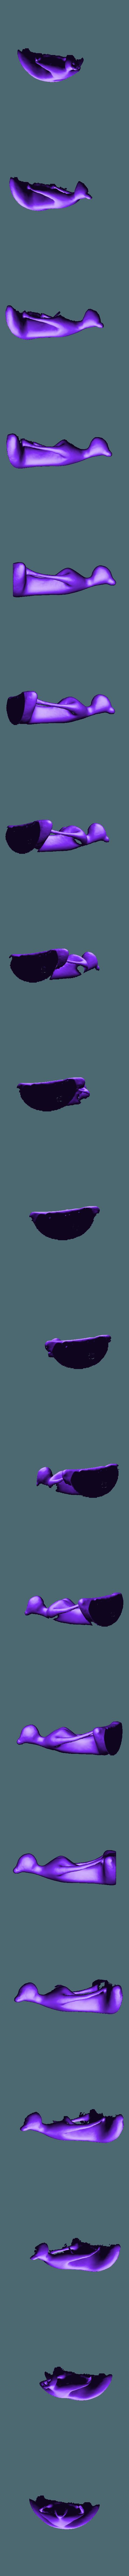 Zen_Sculpture.stl Download free STL file Zen / Yoga Sculpture • 3D printer template, spofff